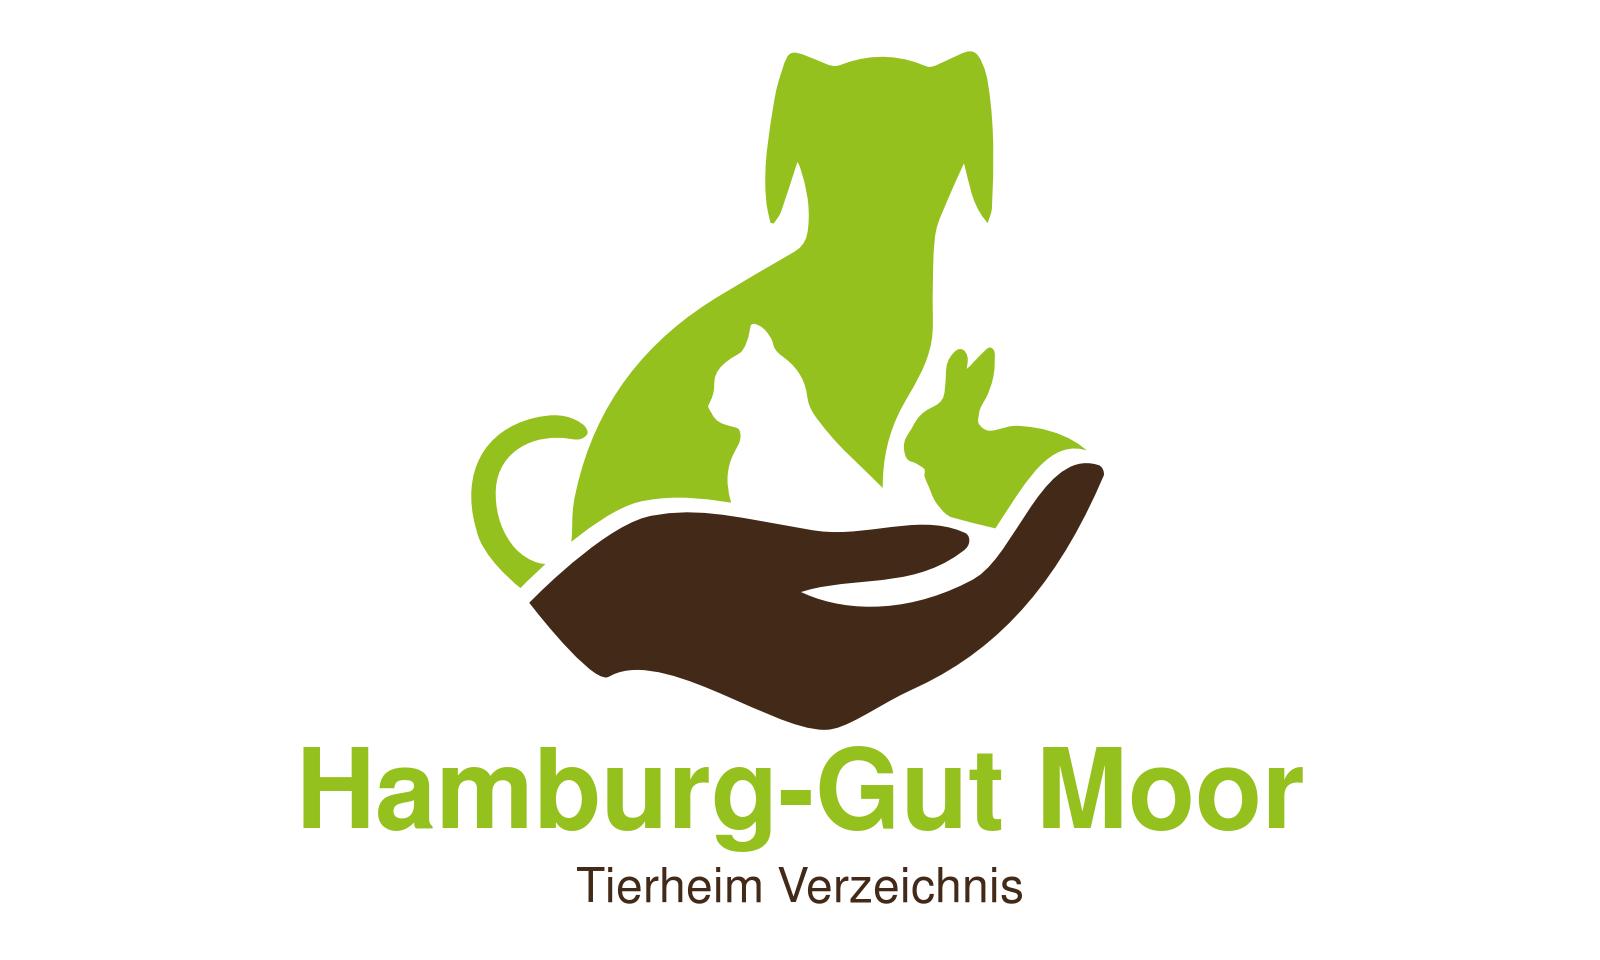 Tierheim Hamburg Gut Moor